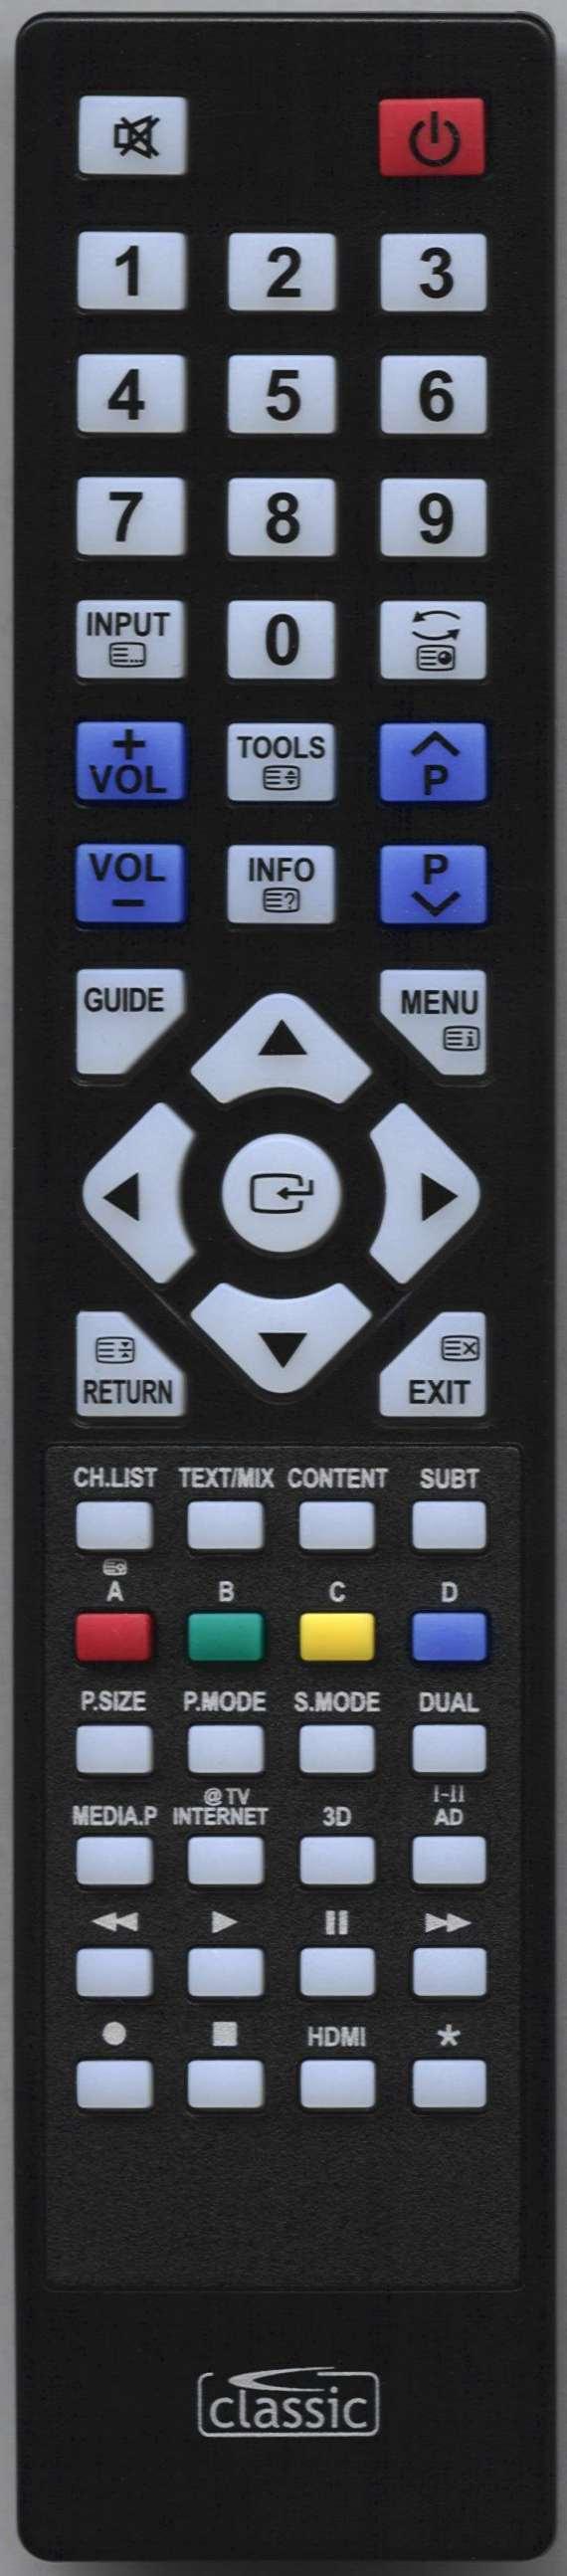 SAMSUNG BN59-01014A Remote Control Alternative